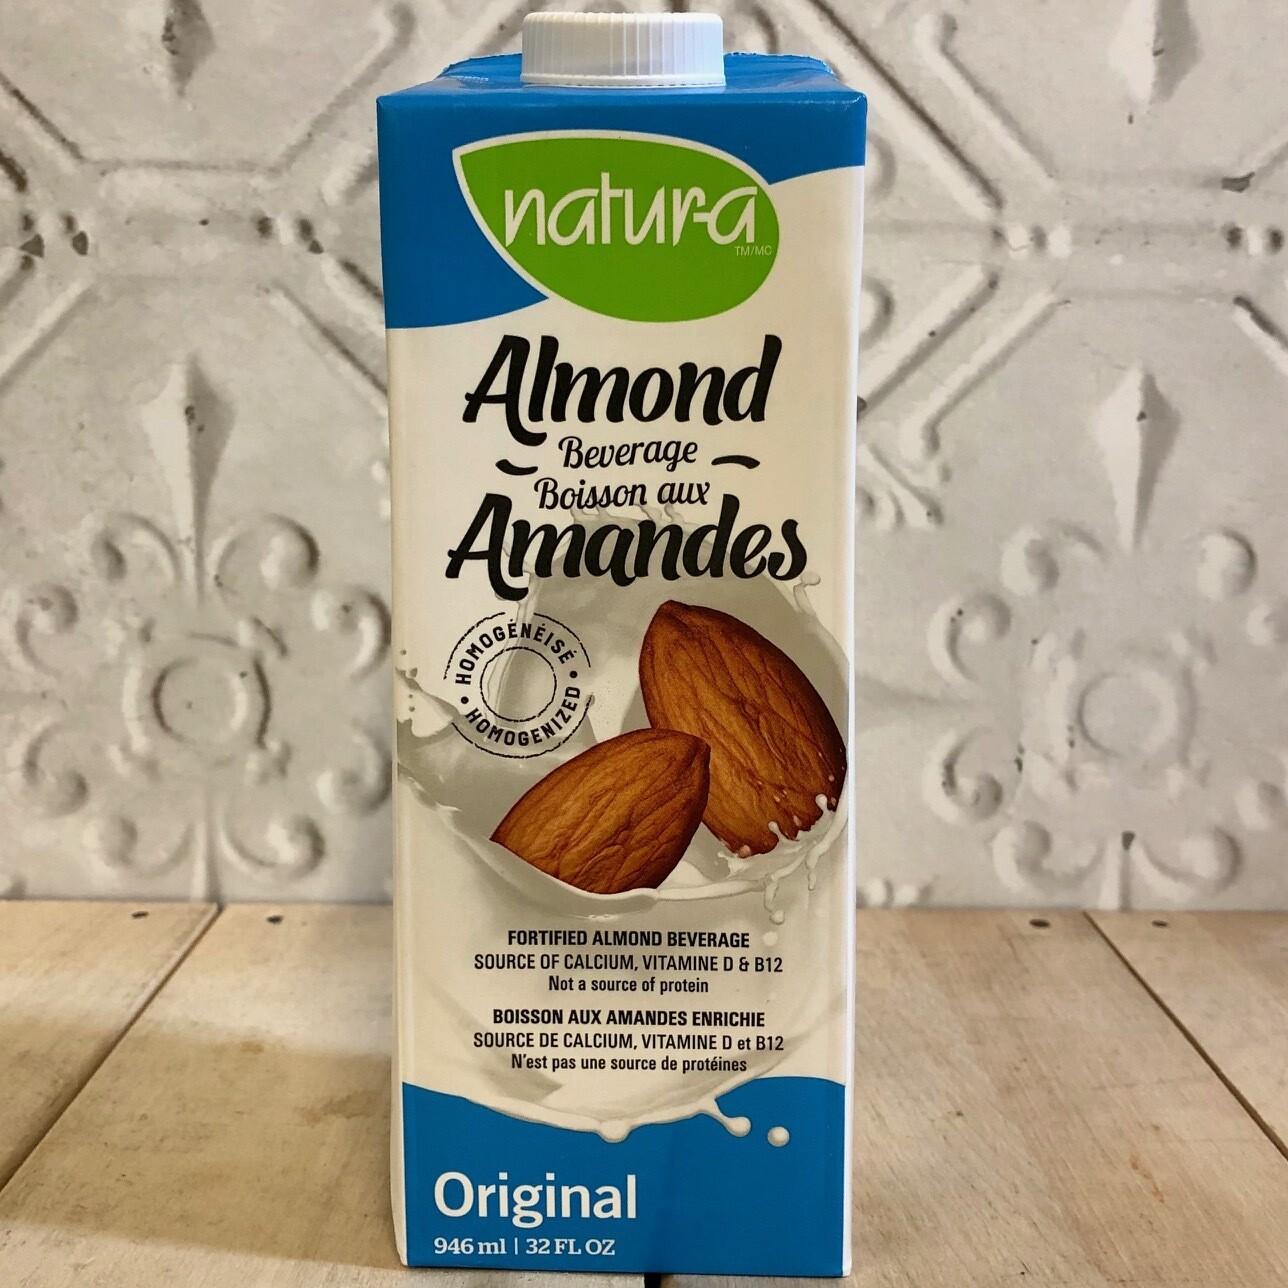 NATURA Almond Beverage Original 946ml